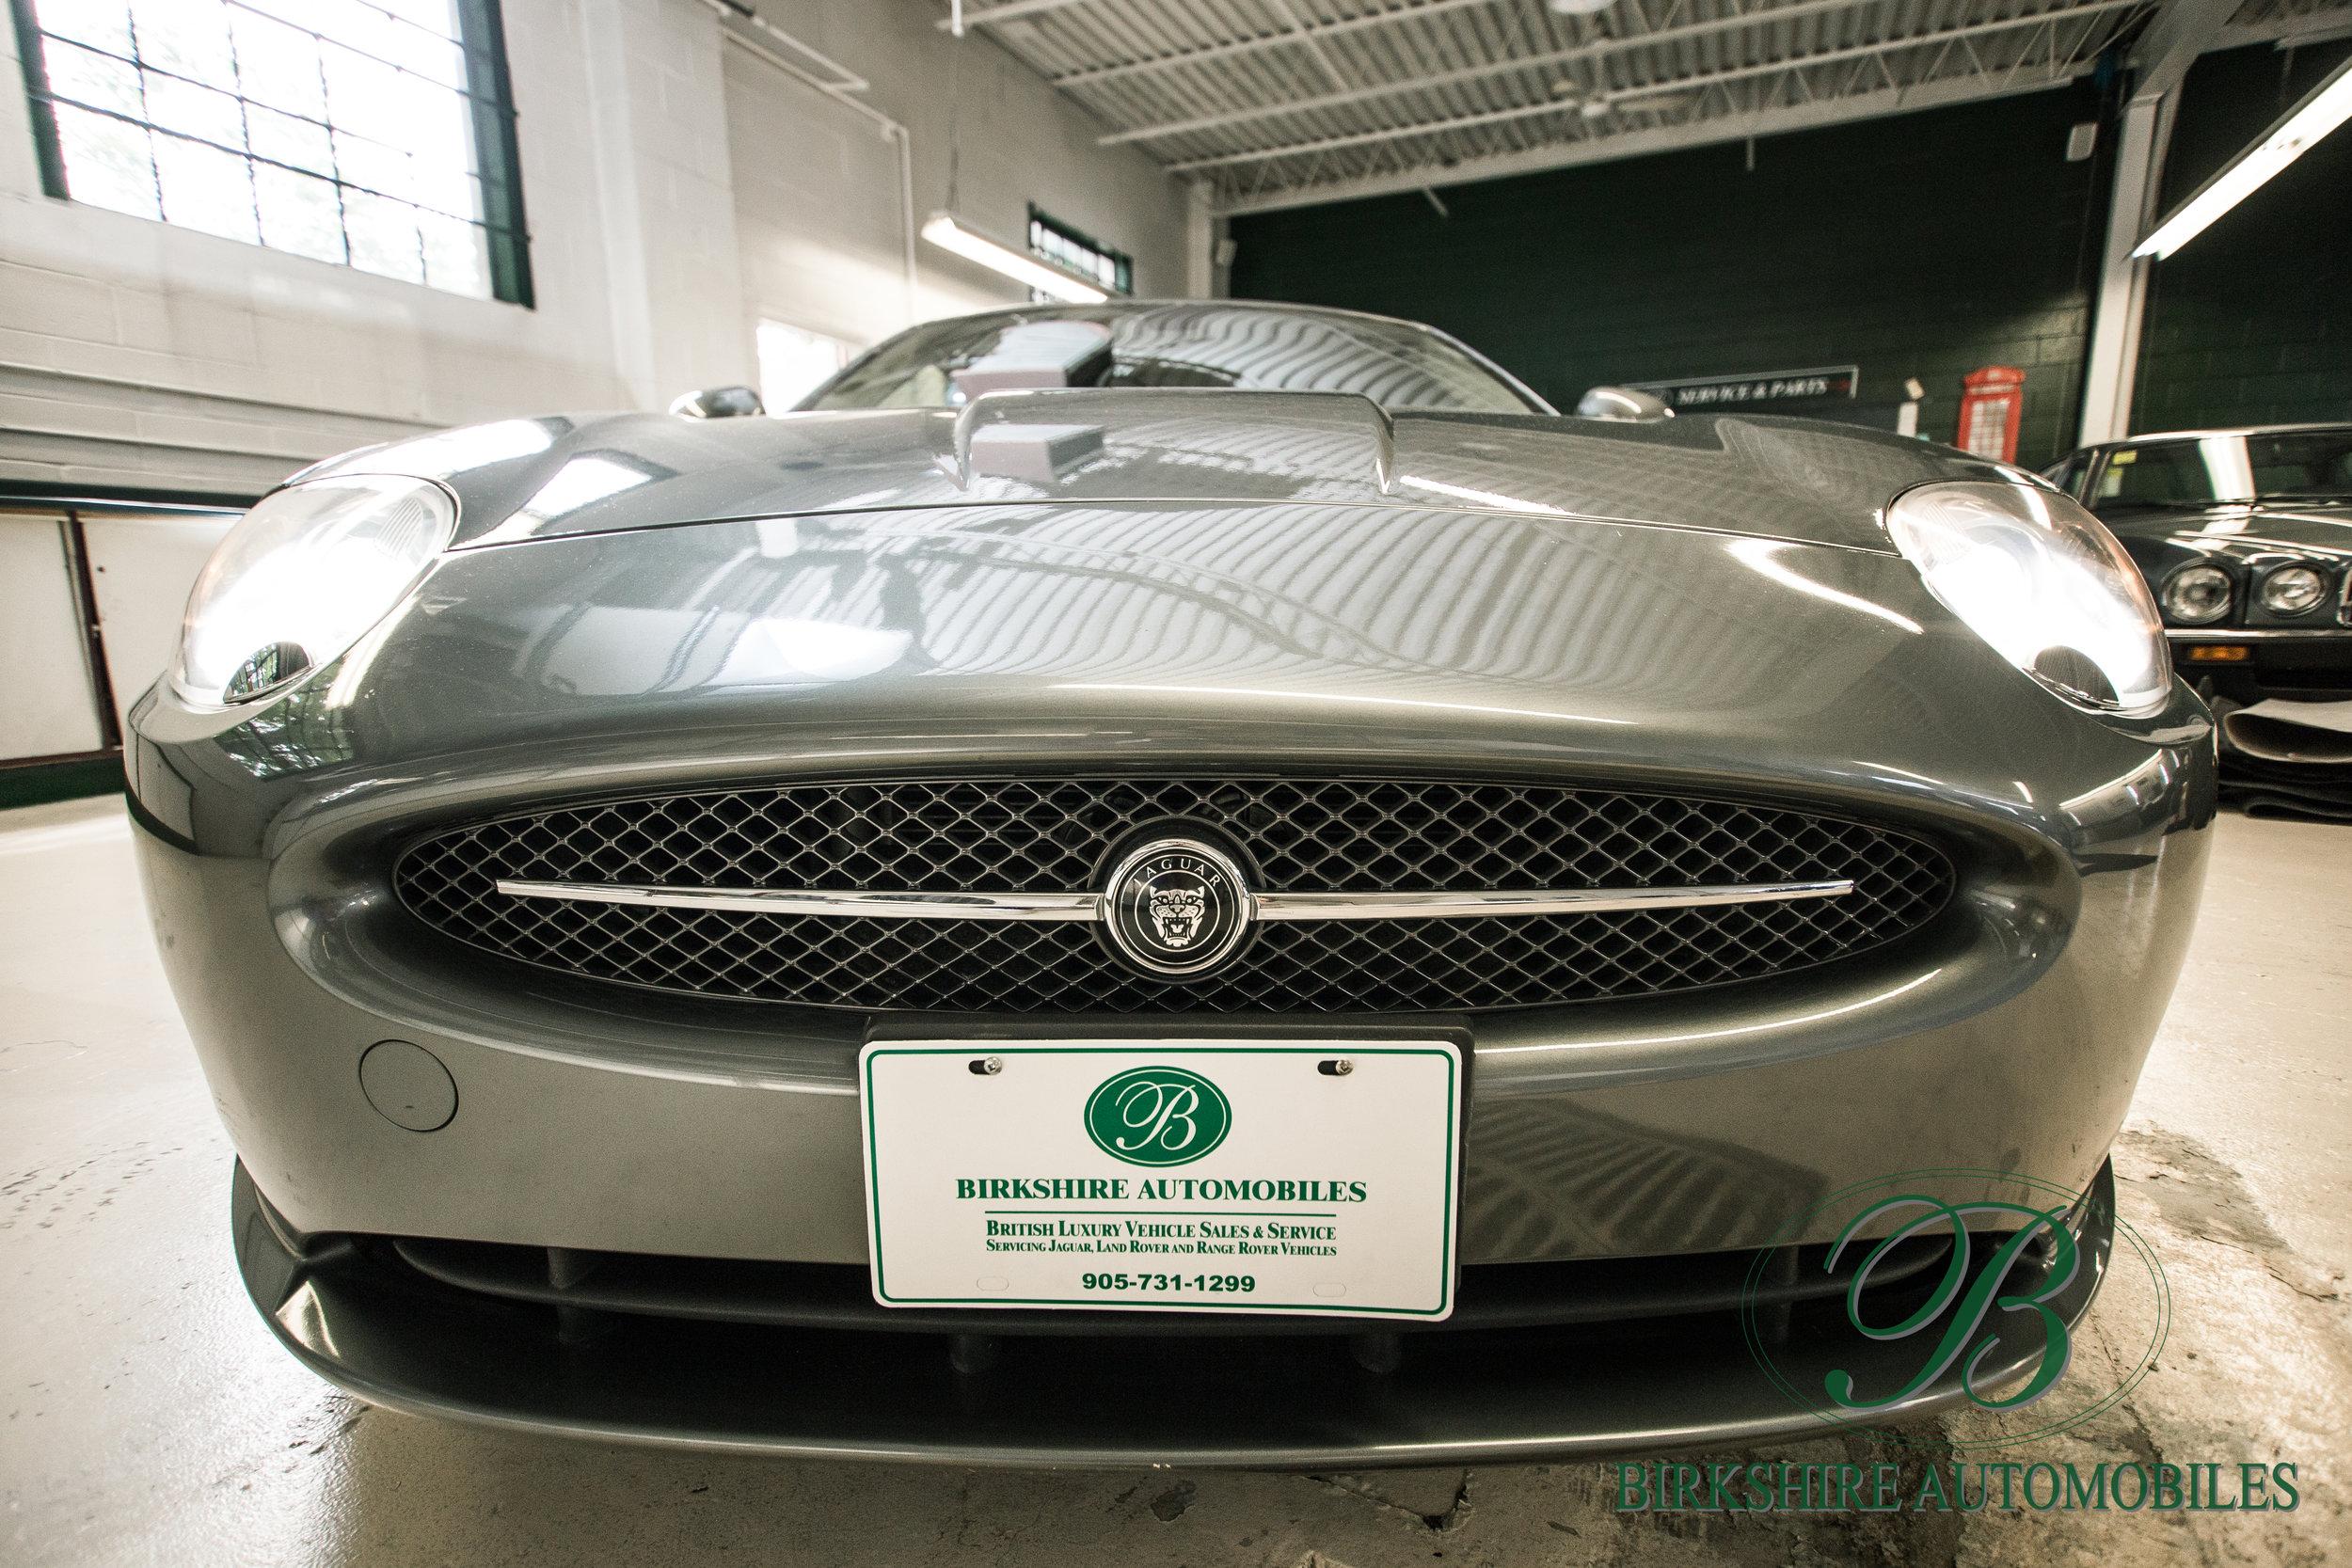 Birkshire Automobiles-147.jpg